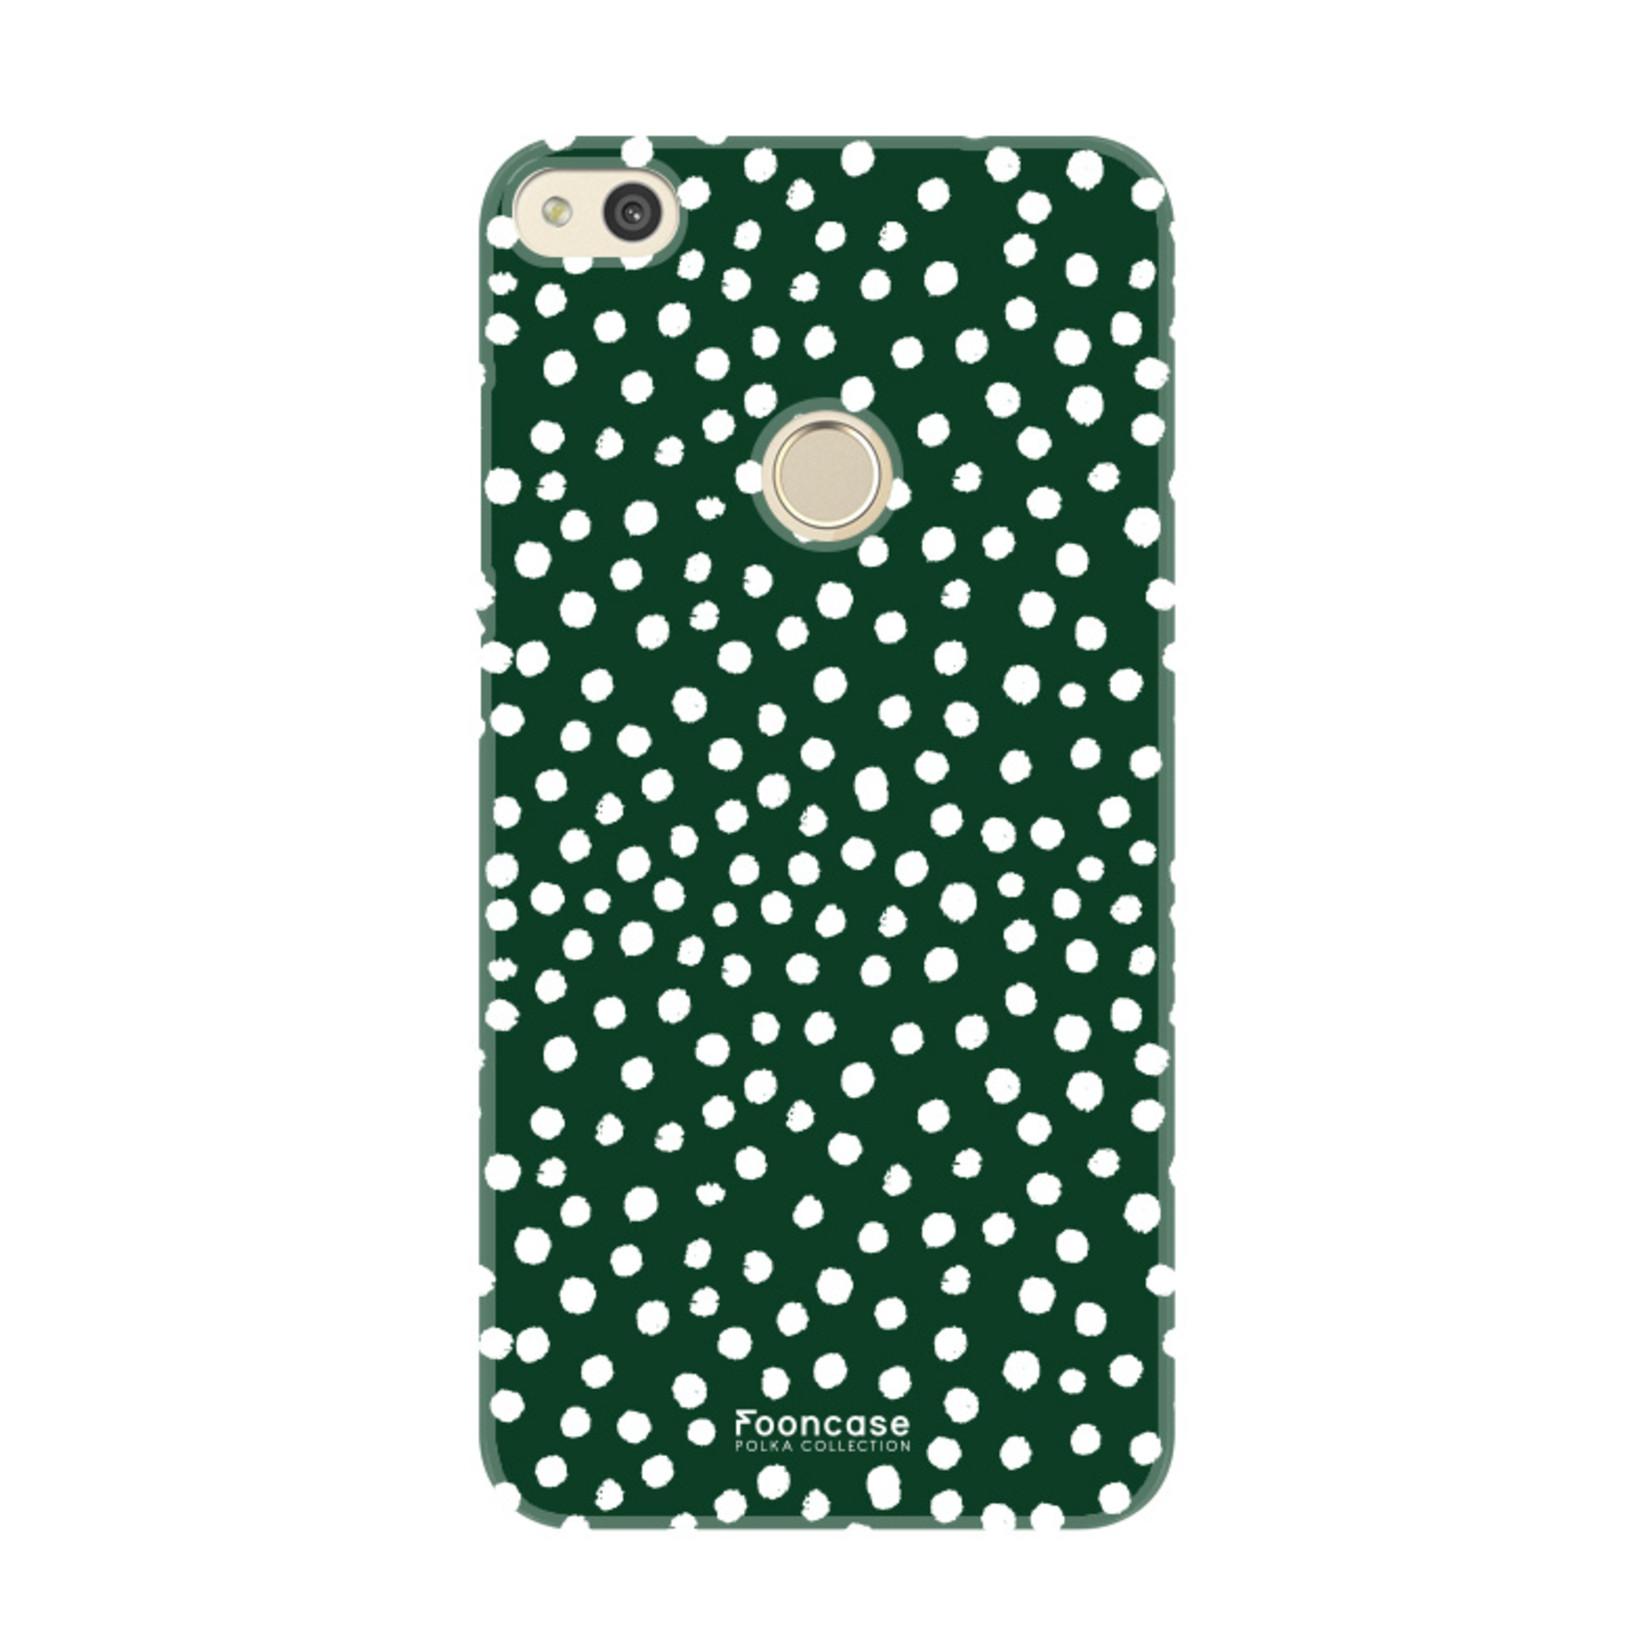 FOONCASE Huawei P8 Lite 2017 - POLKA COLLECTION / Grün